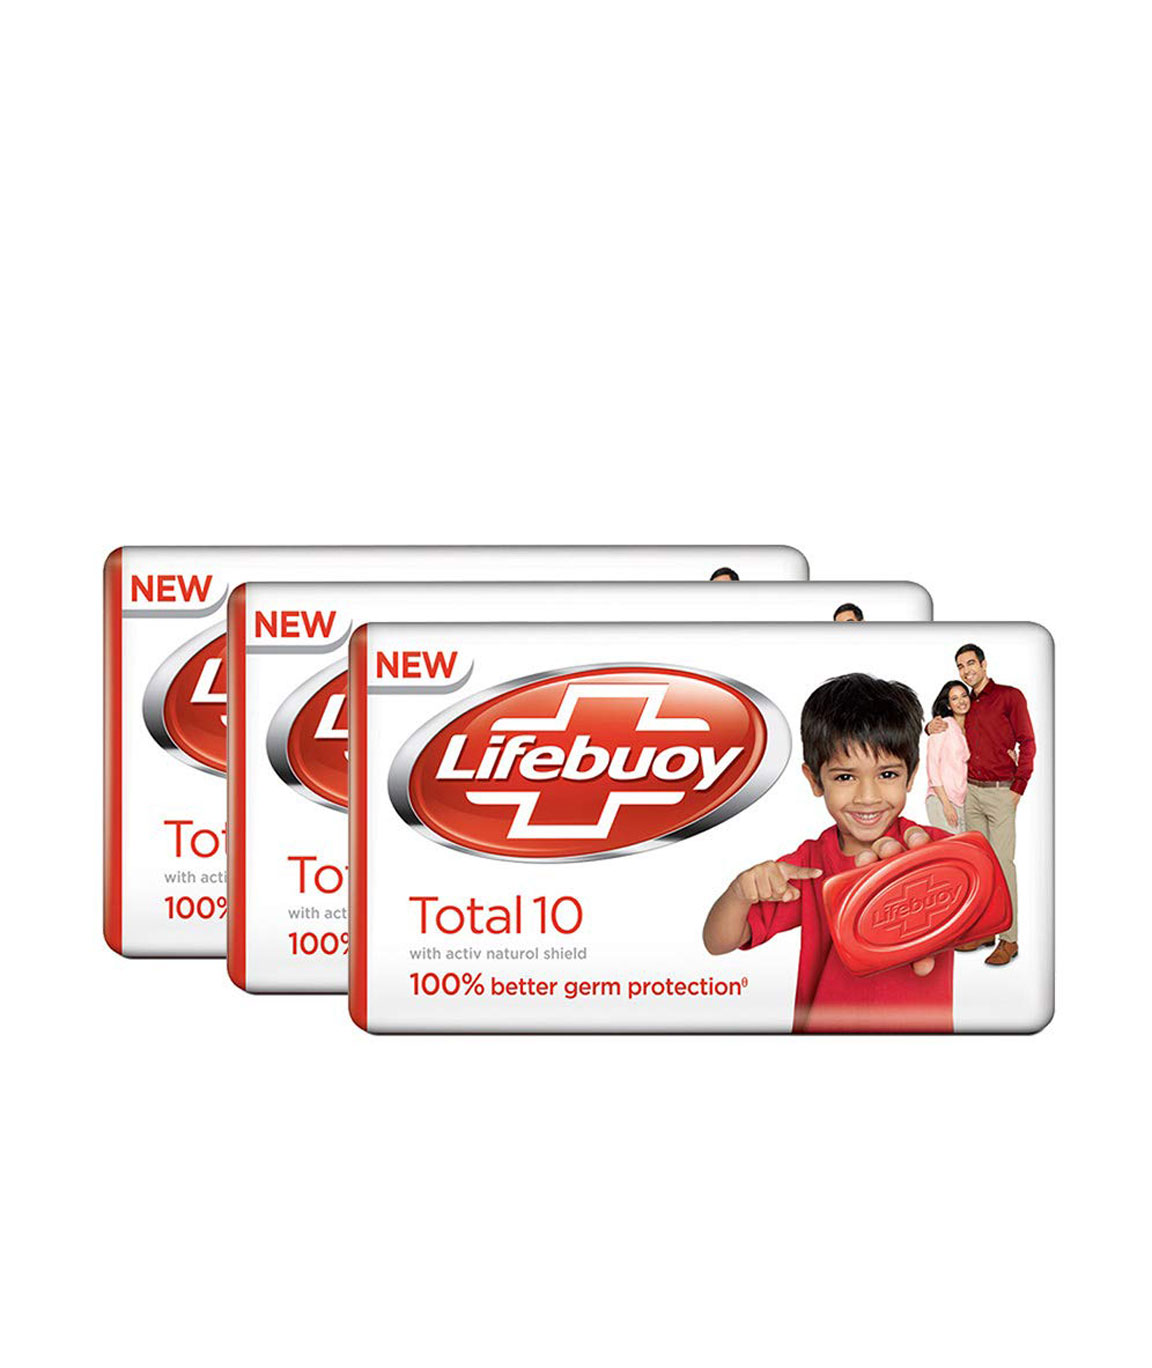 Lifebuoy Total 10 Soap Bar, 3x100gm